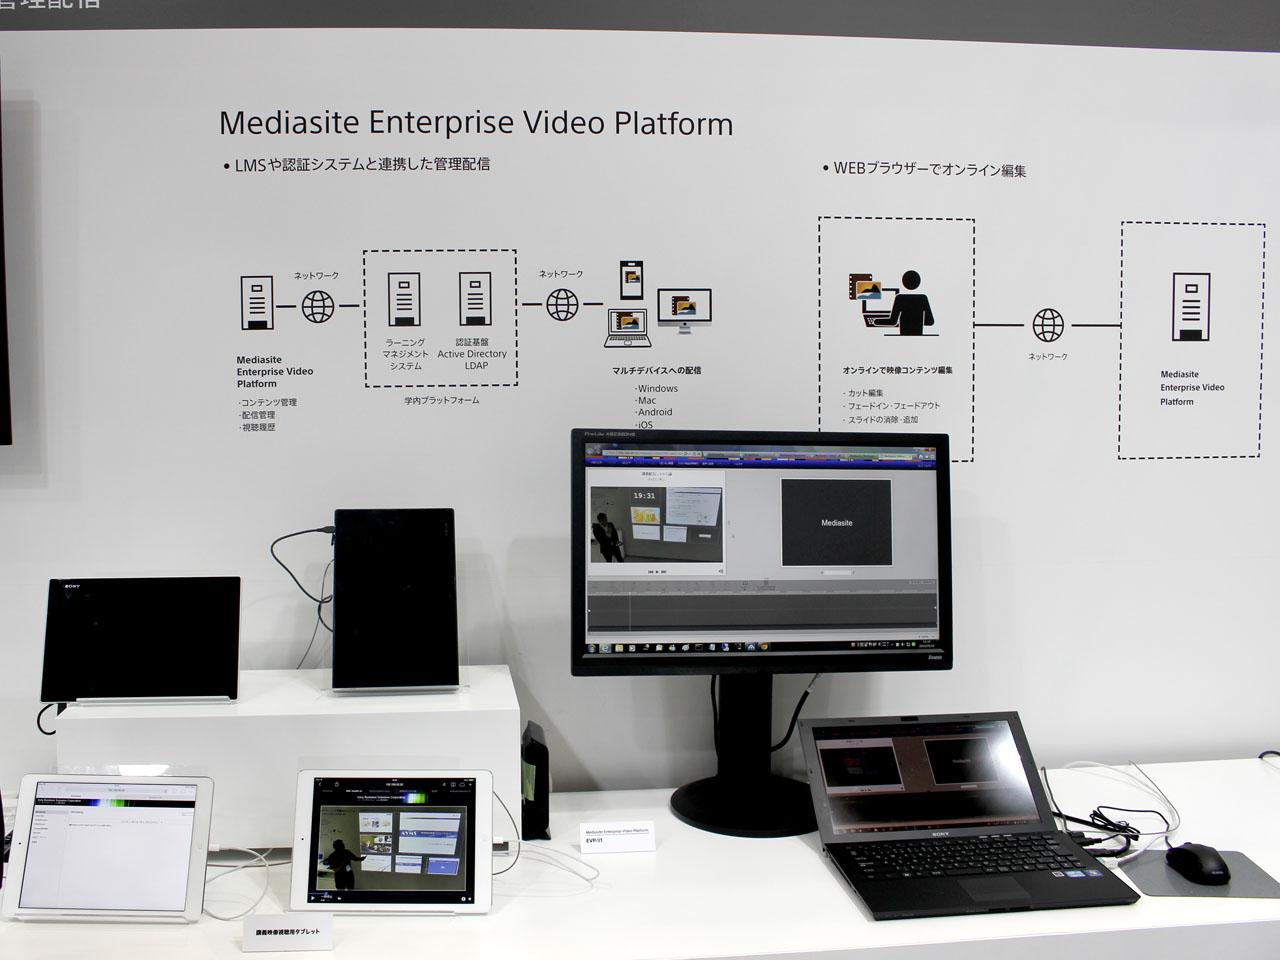 Mediasite Enterprise Video Platformは、講義を収録した動画コンテンツの収録から配信までを提供。LDAP認証サーバーやLMSとの連携にも対応する